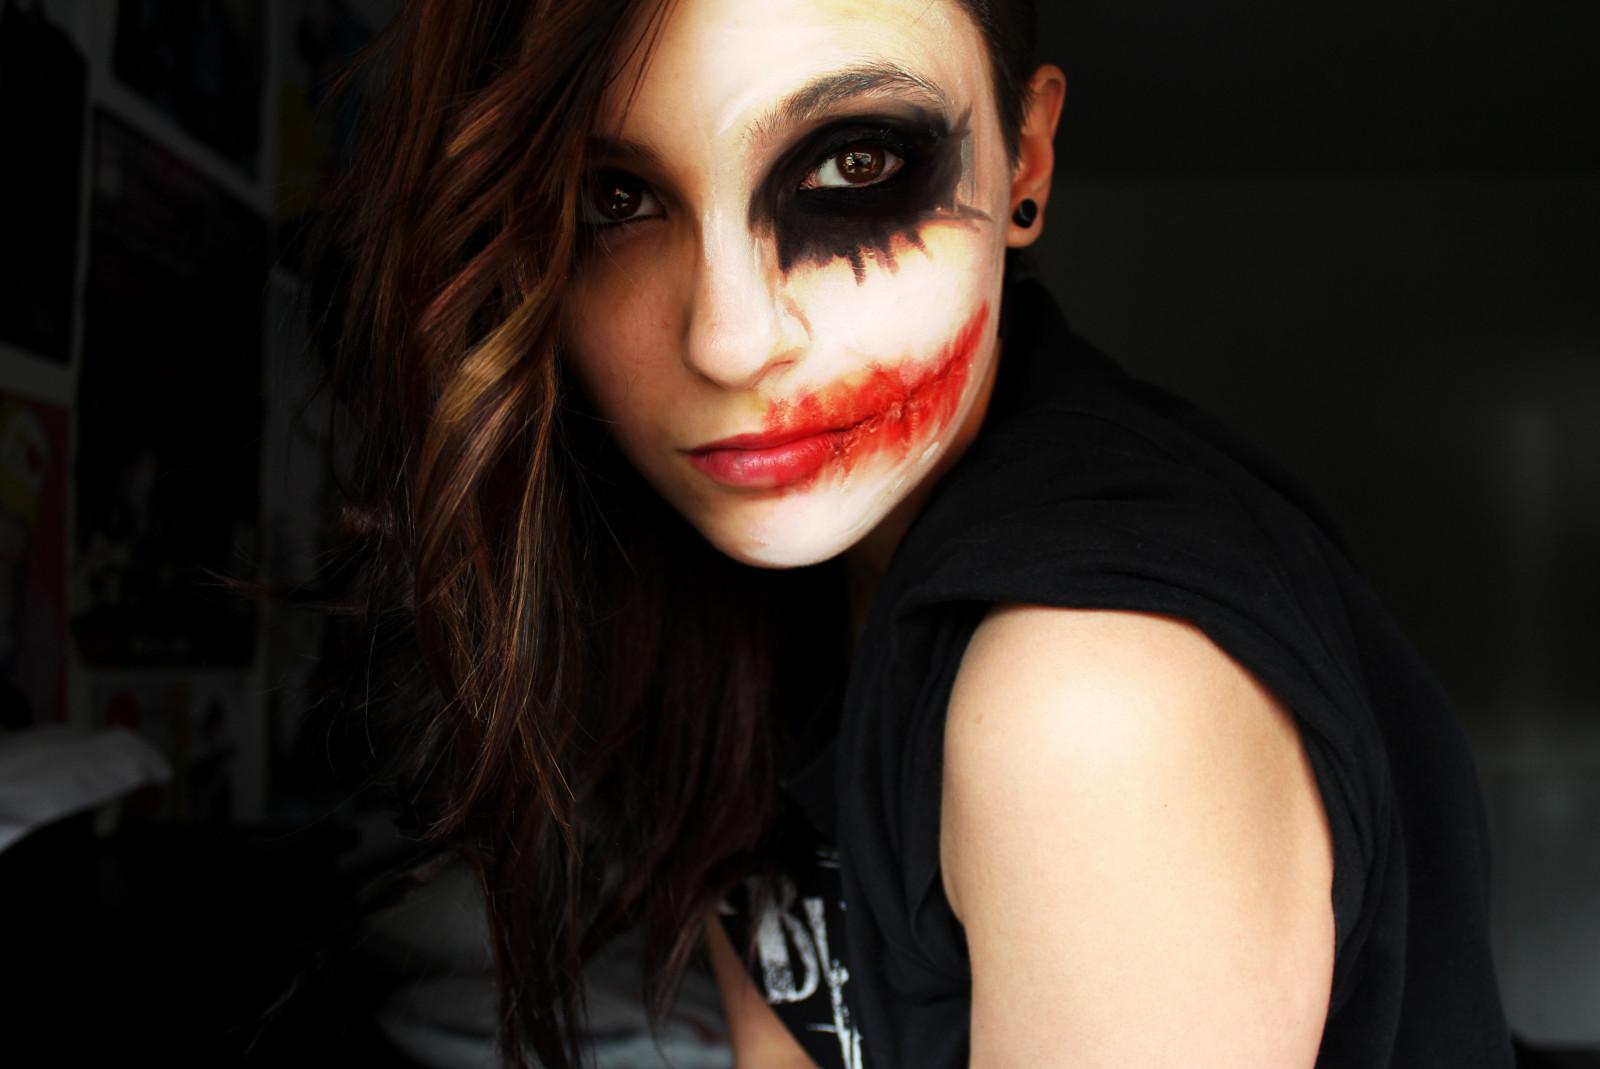 Wallpaper  Face Women Model Portrait Glasses Red Makeup Joker Fashion Clothing Head ...